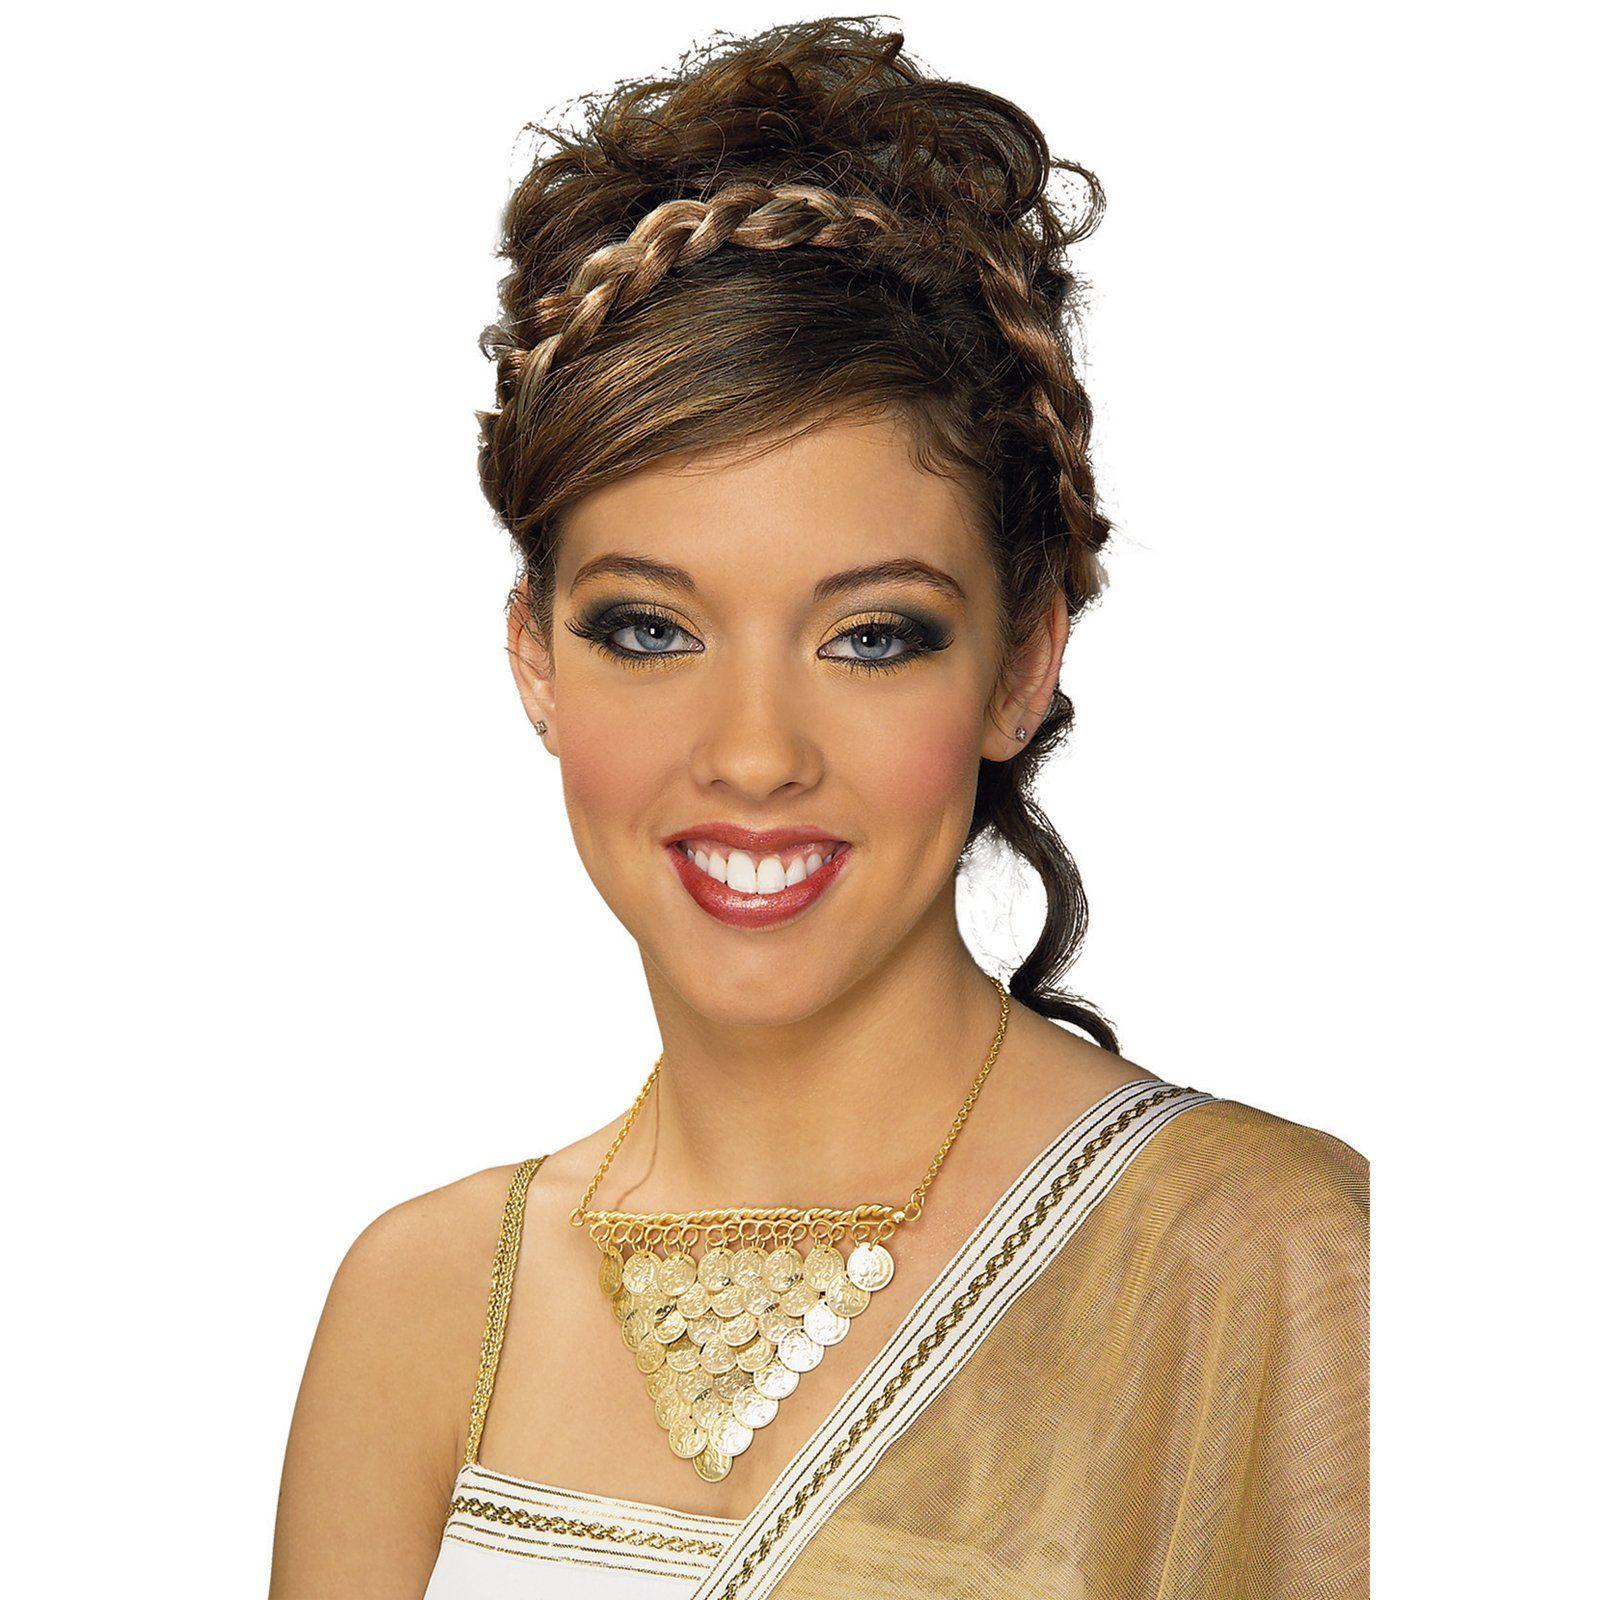 Roman Goddess Hairstyles | Easy, andgreek goddess anygreek ...